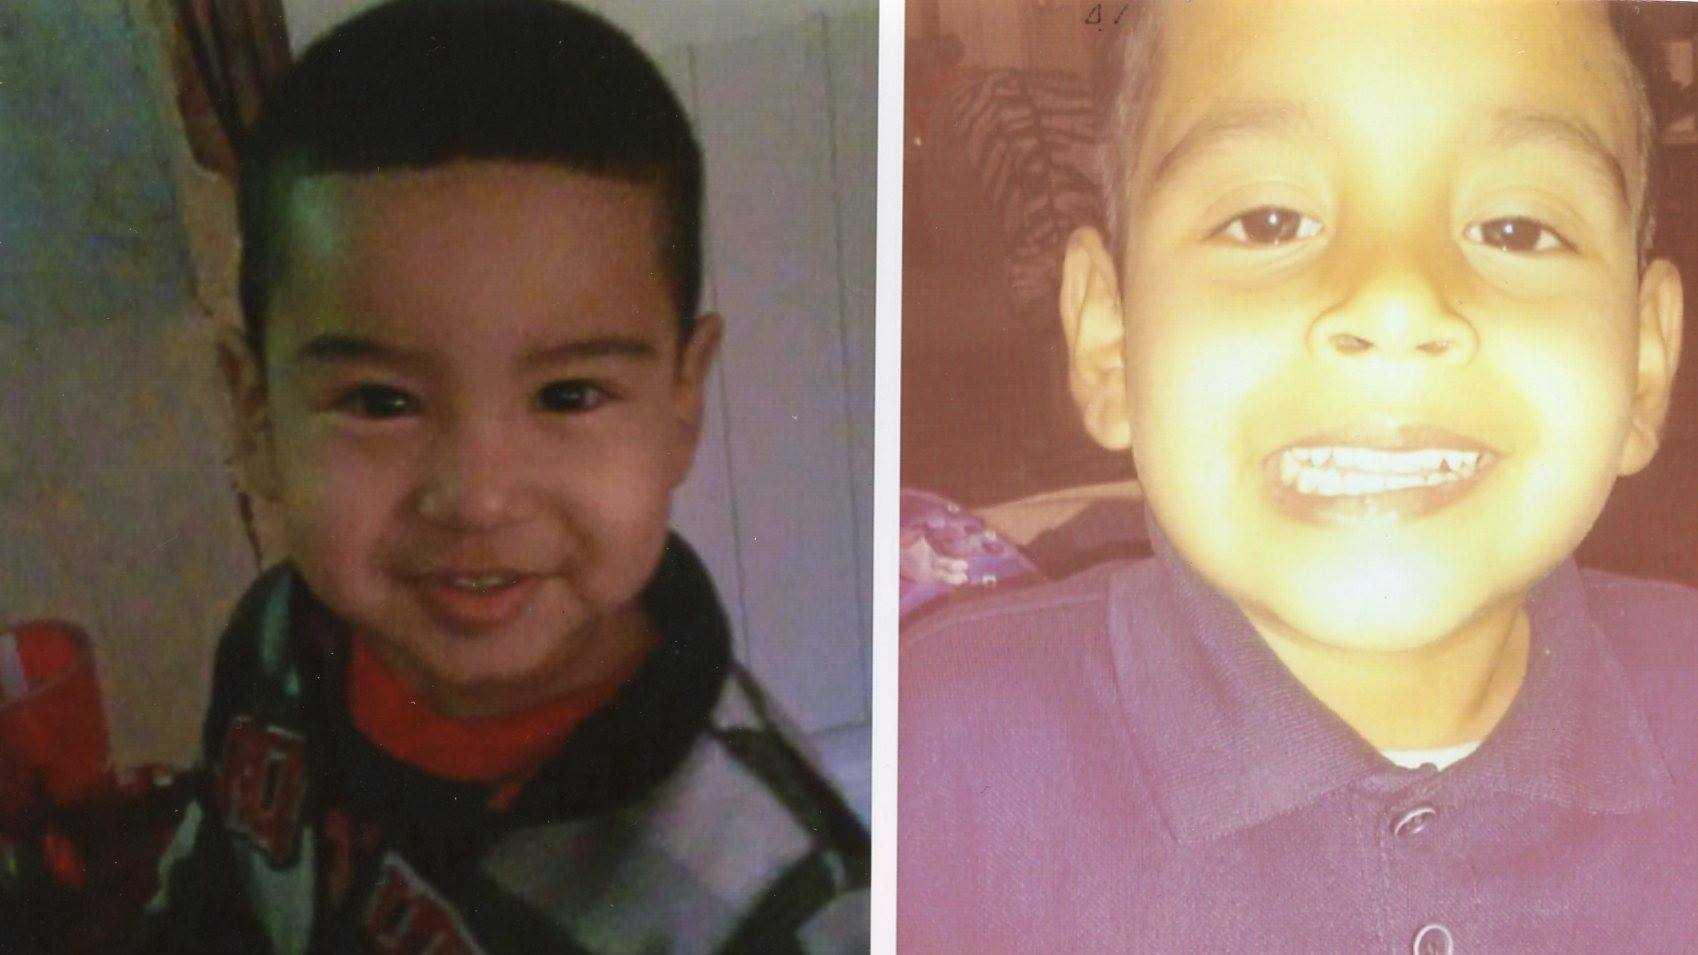 5 year-old Cesar Mazariegos and 2 year-old Angel Mazariegos